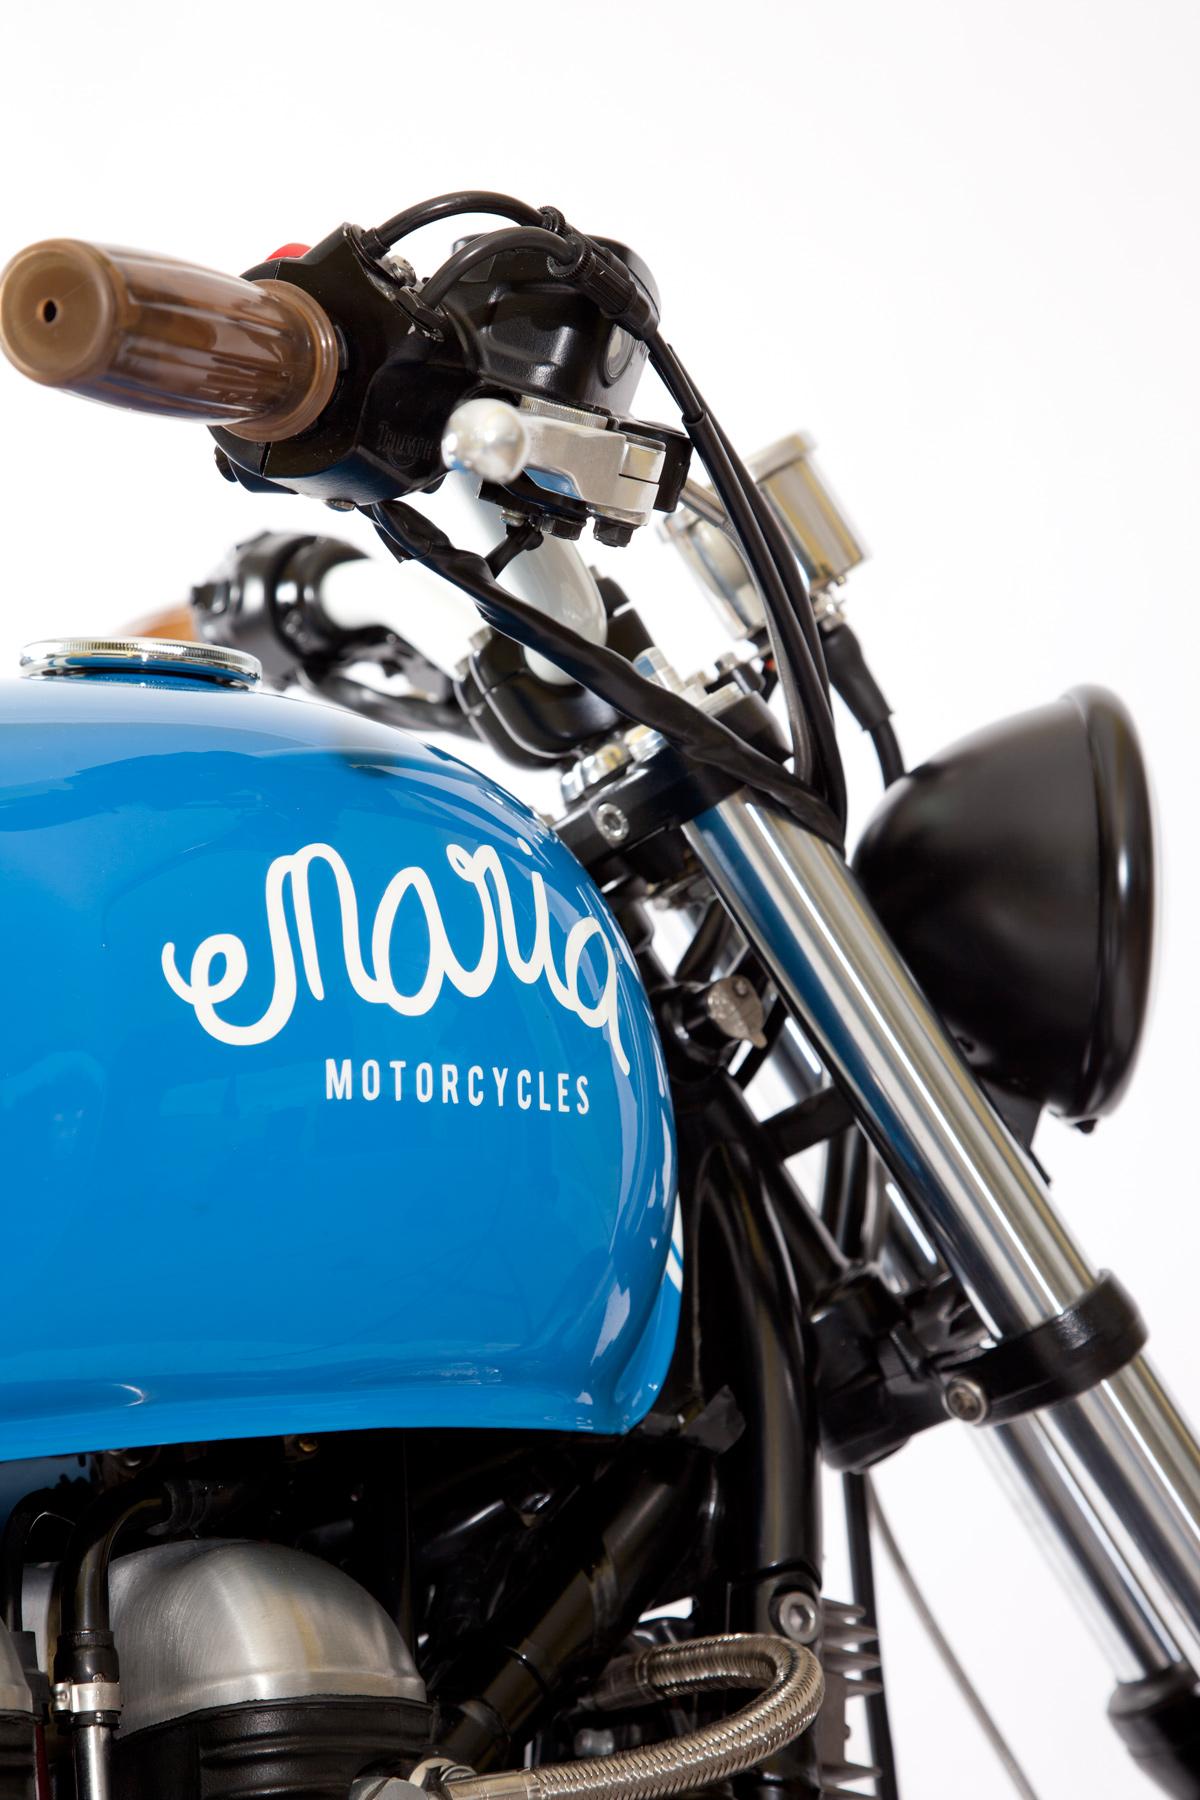 maria_motorcycles_triumph_thruxton_mightyblue_7403